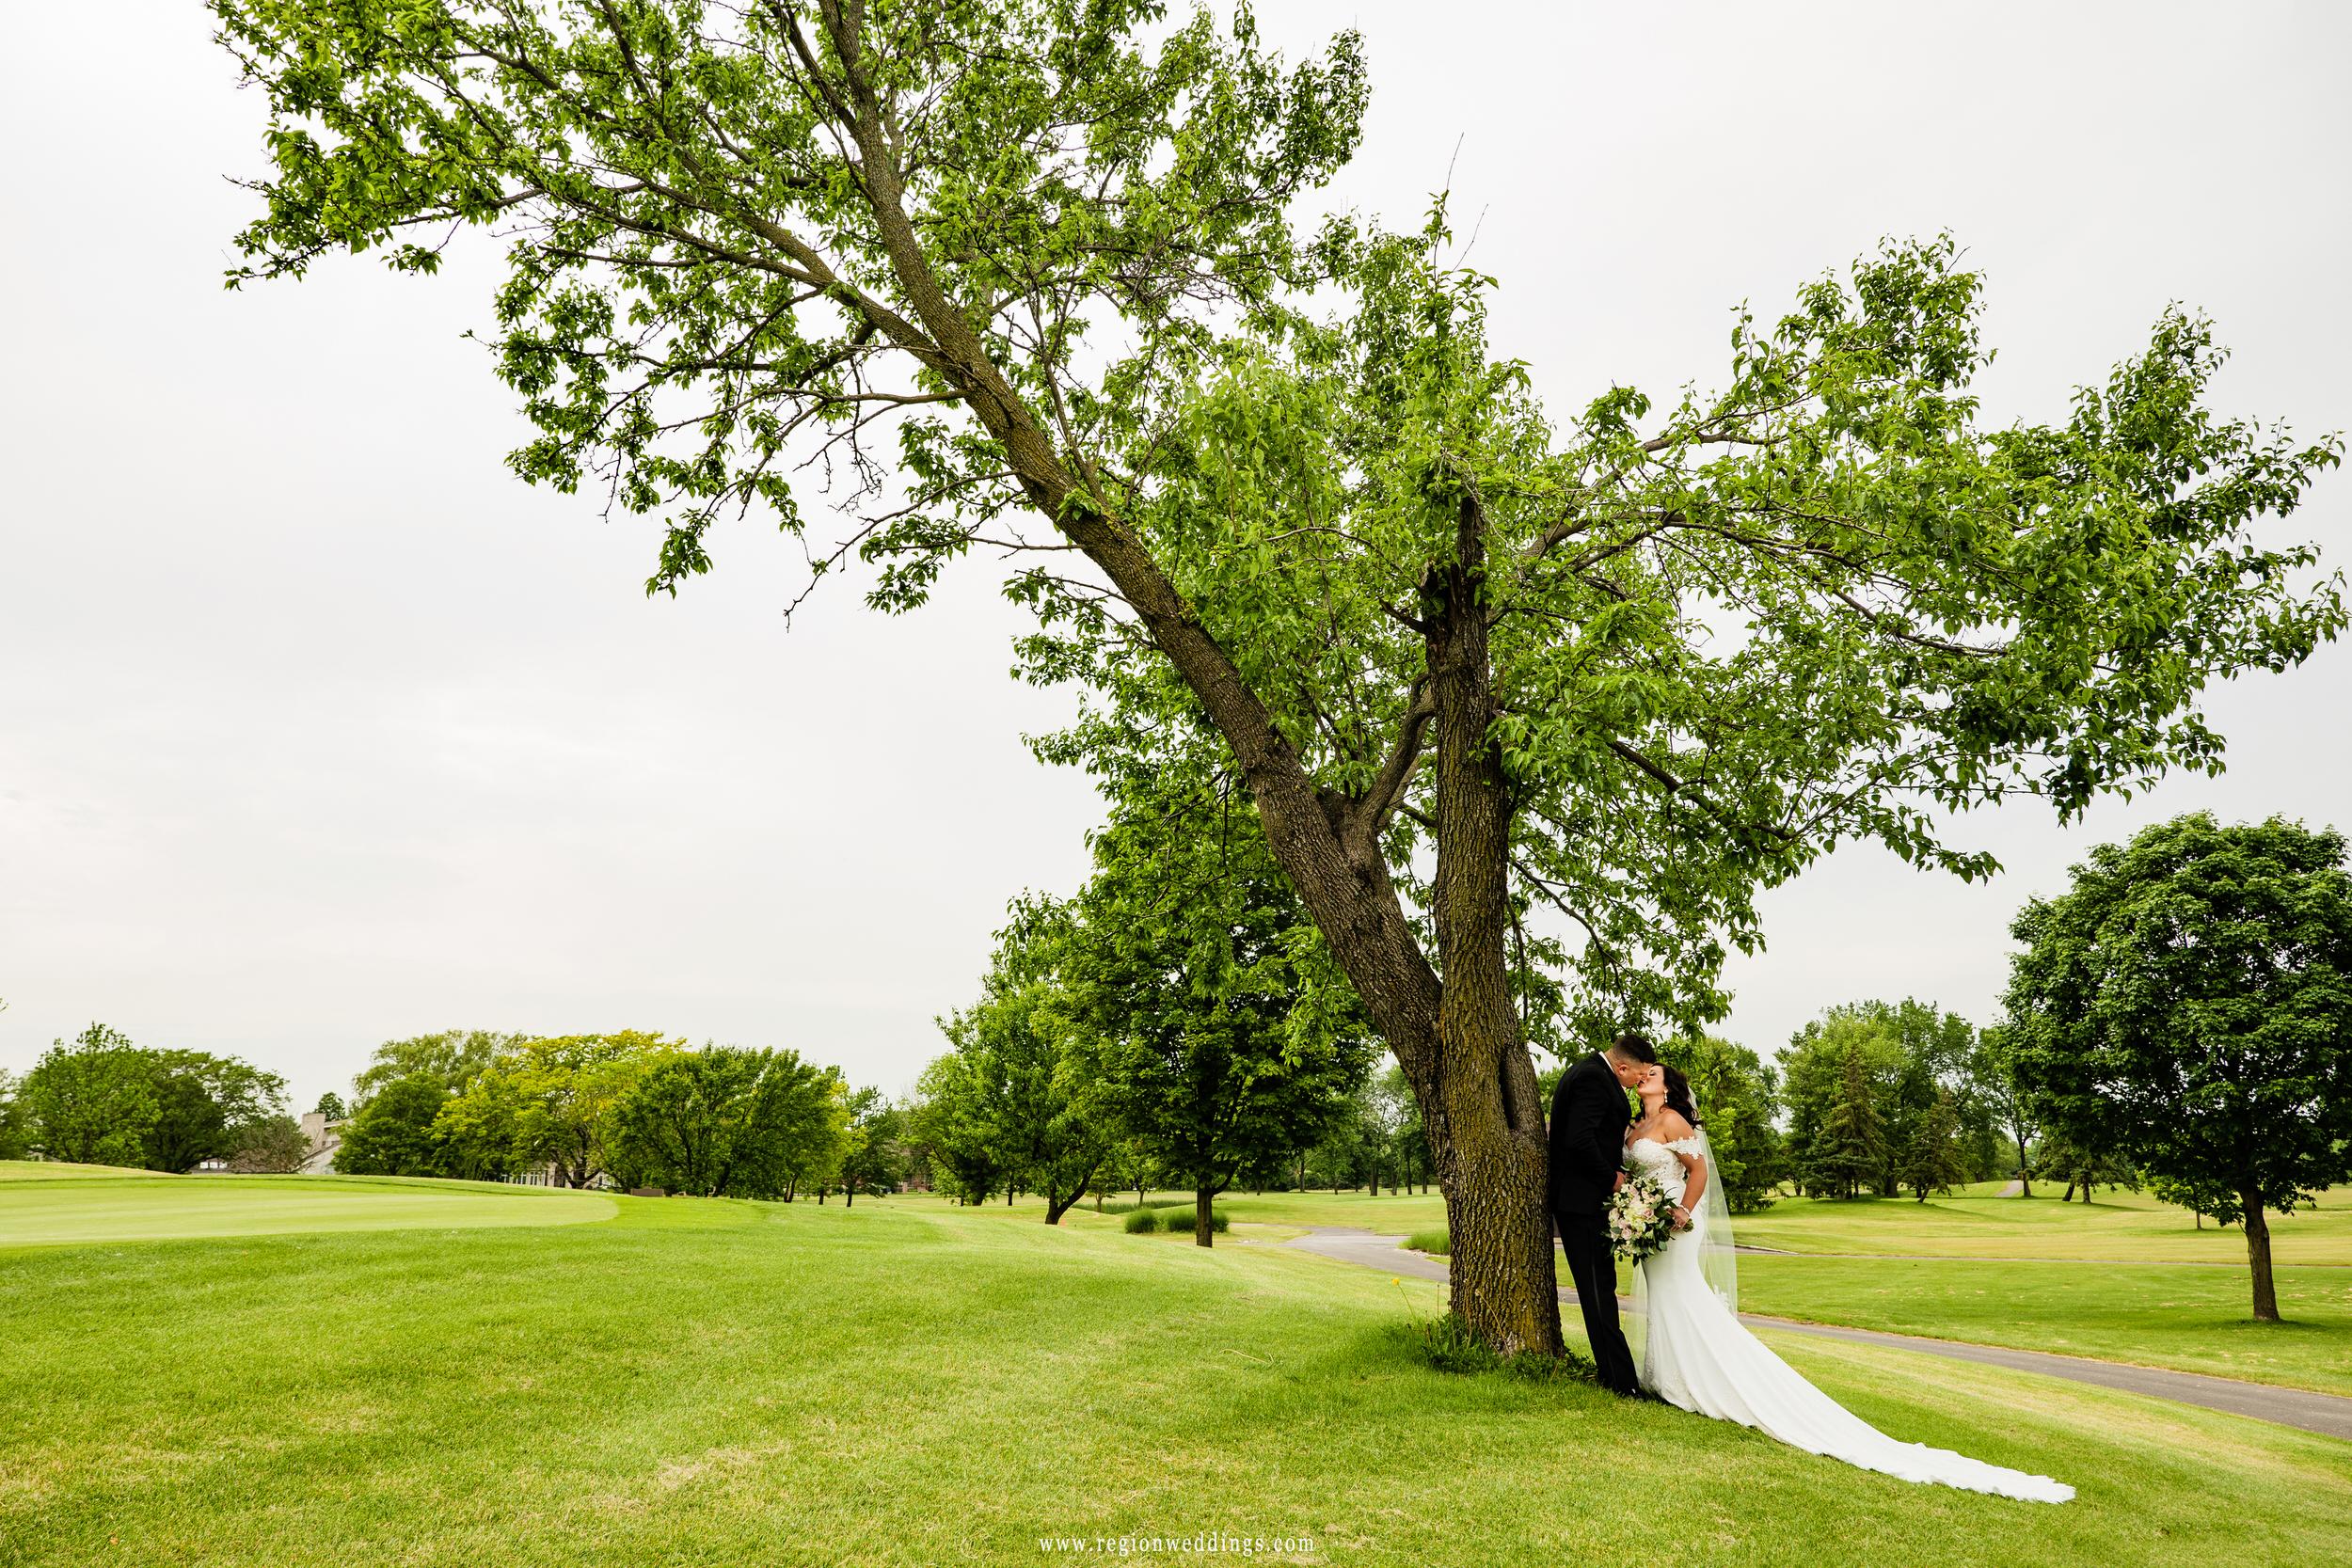 Sharing a kiss beneath the big tree.